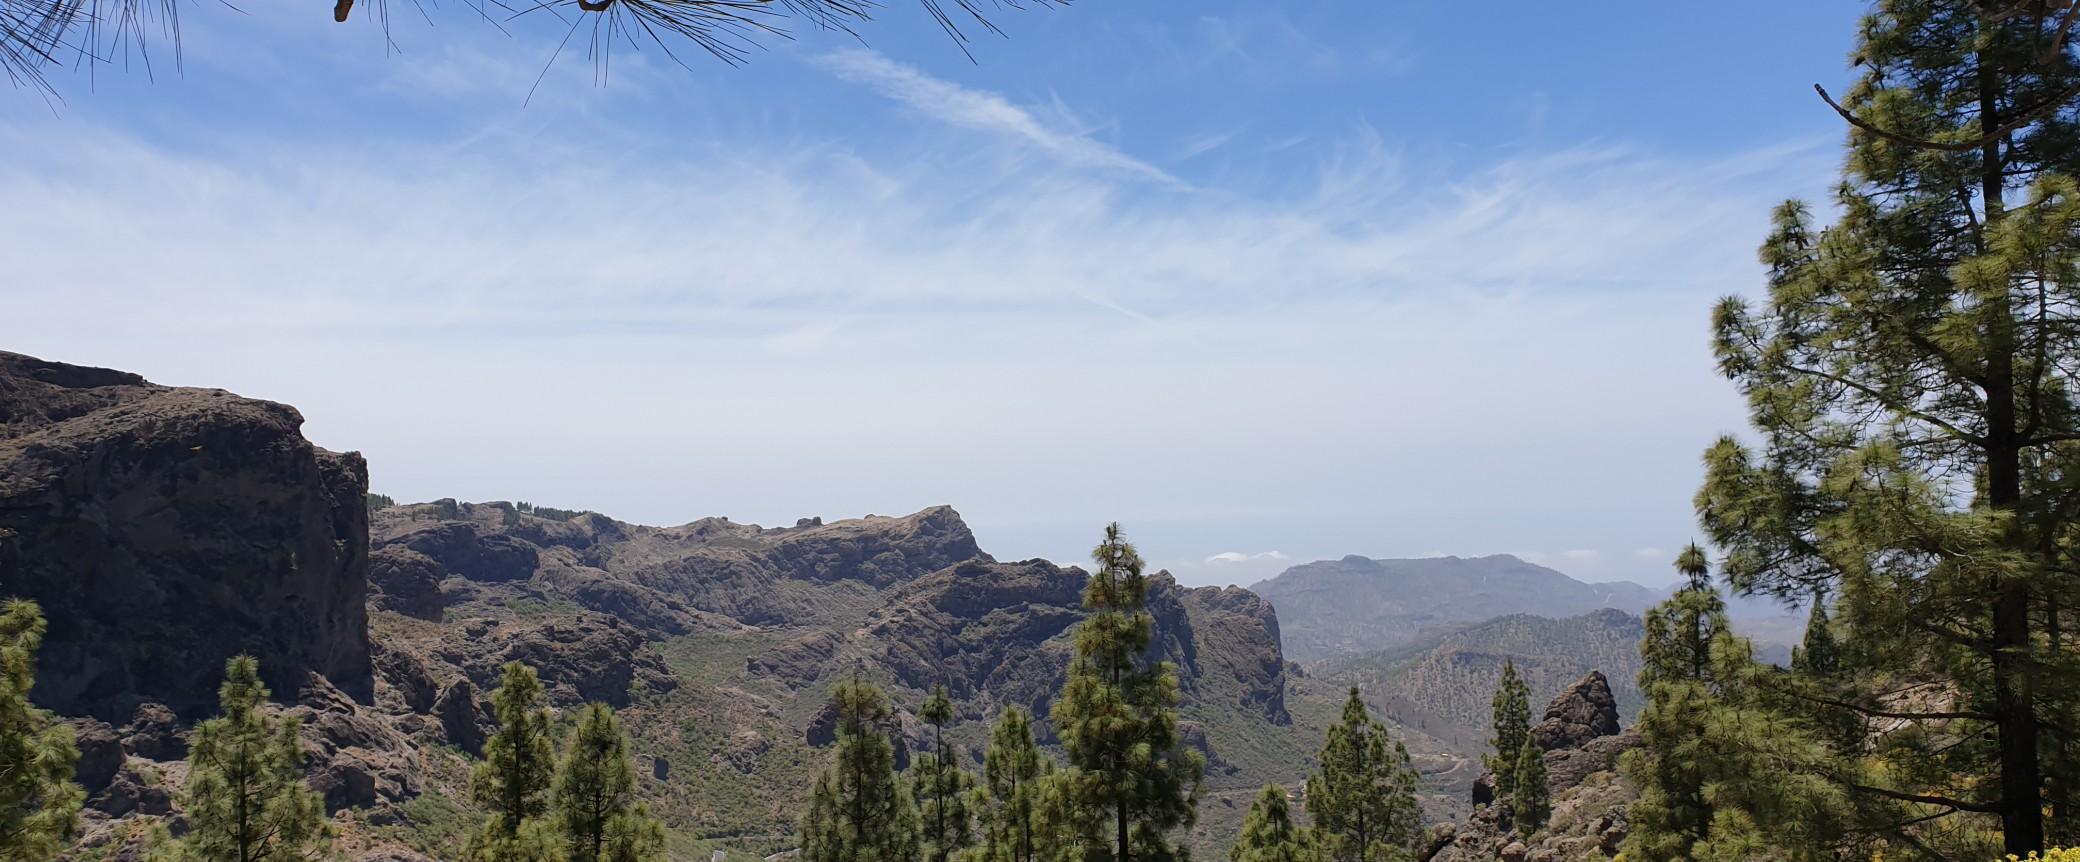 Roque Nublo Gran Canaria Hiking world tour